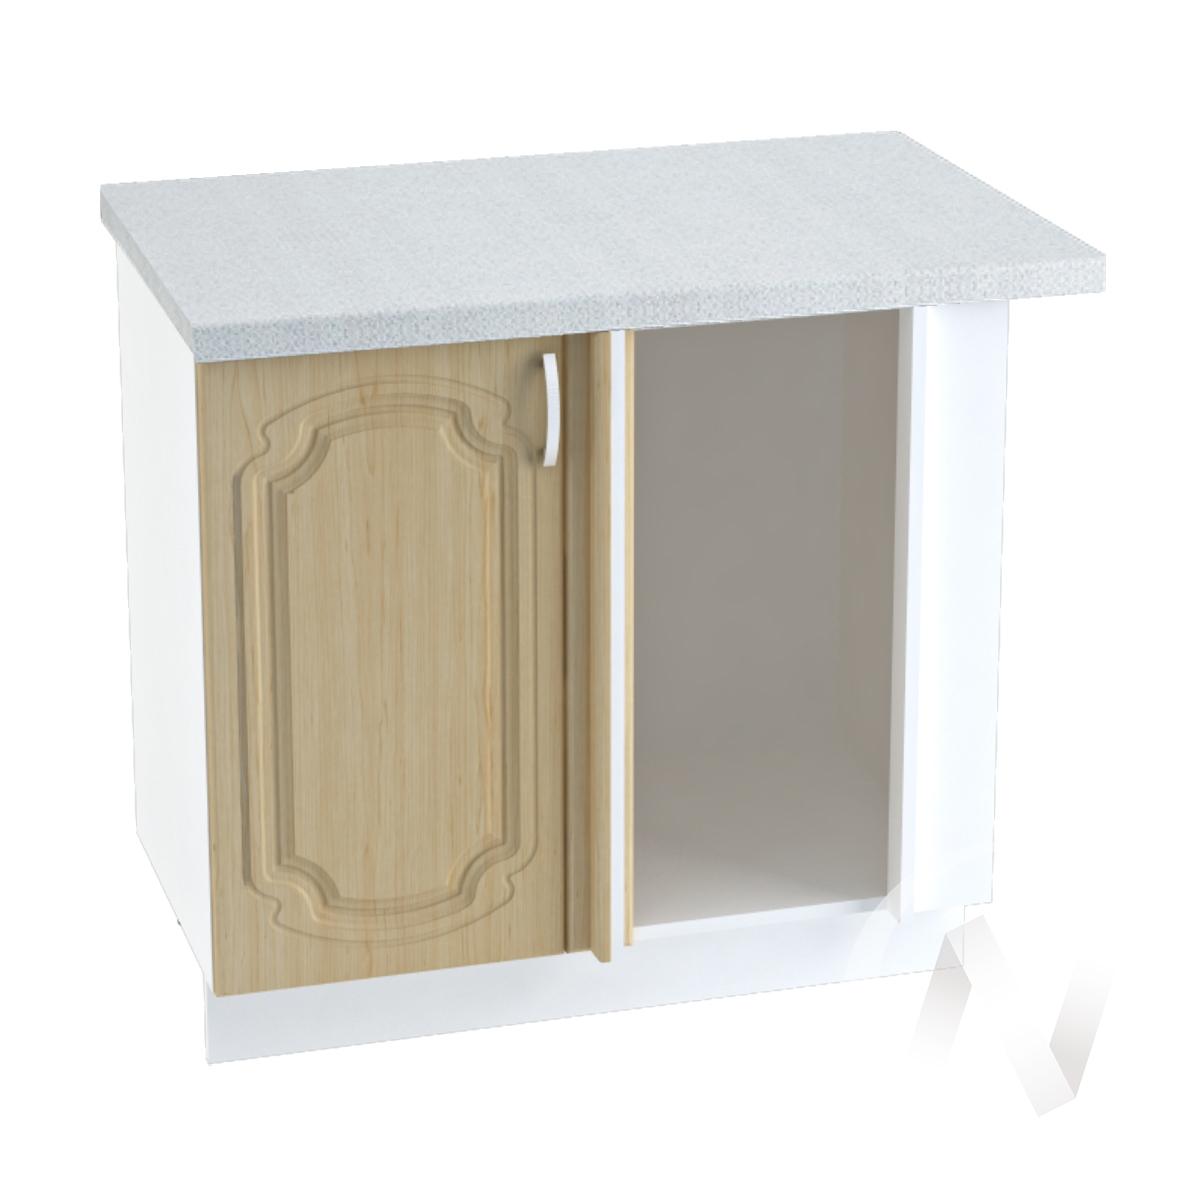 "Кухня ""Настя"": Шкаф нижний угловой 990М, ШНУ 990М (Береза/корпус белый)"